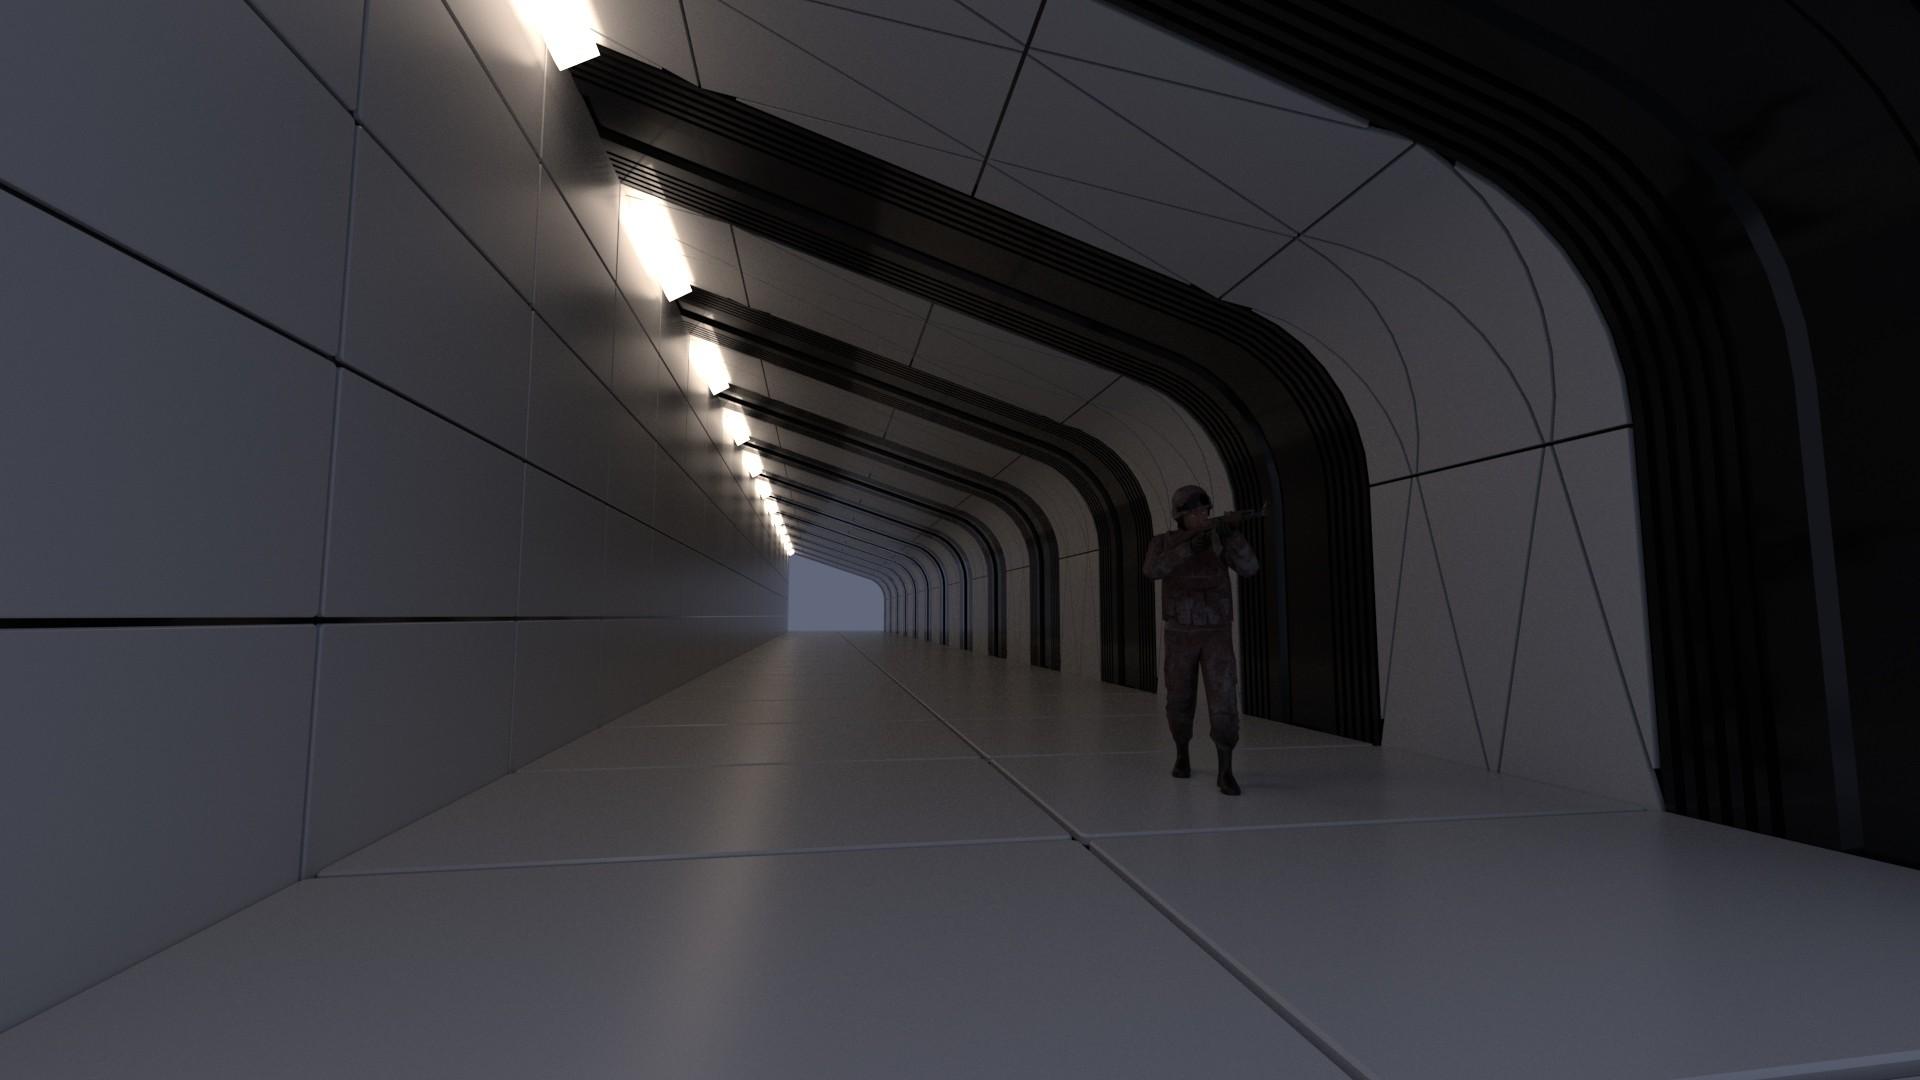 Iain gillespie corridor 2